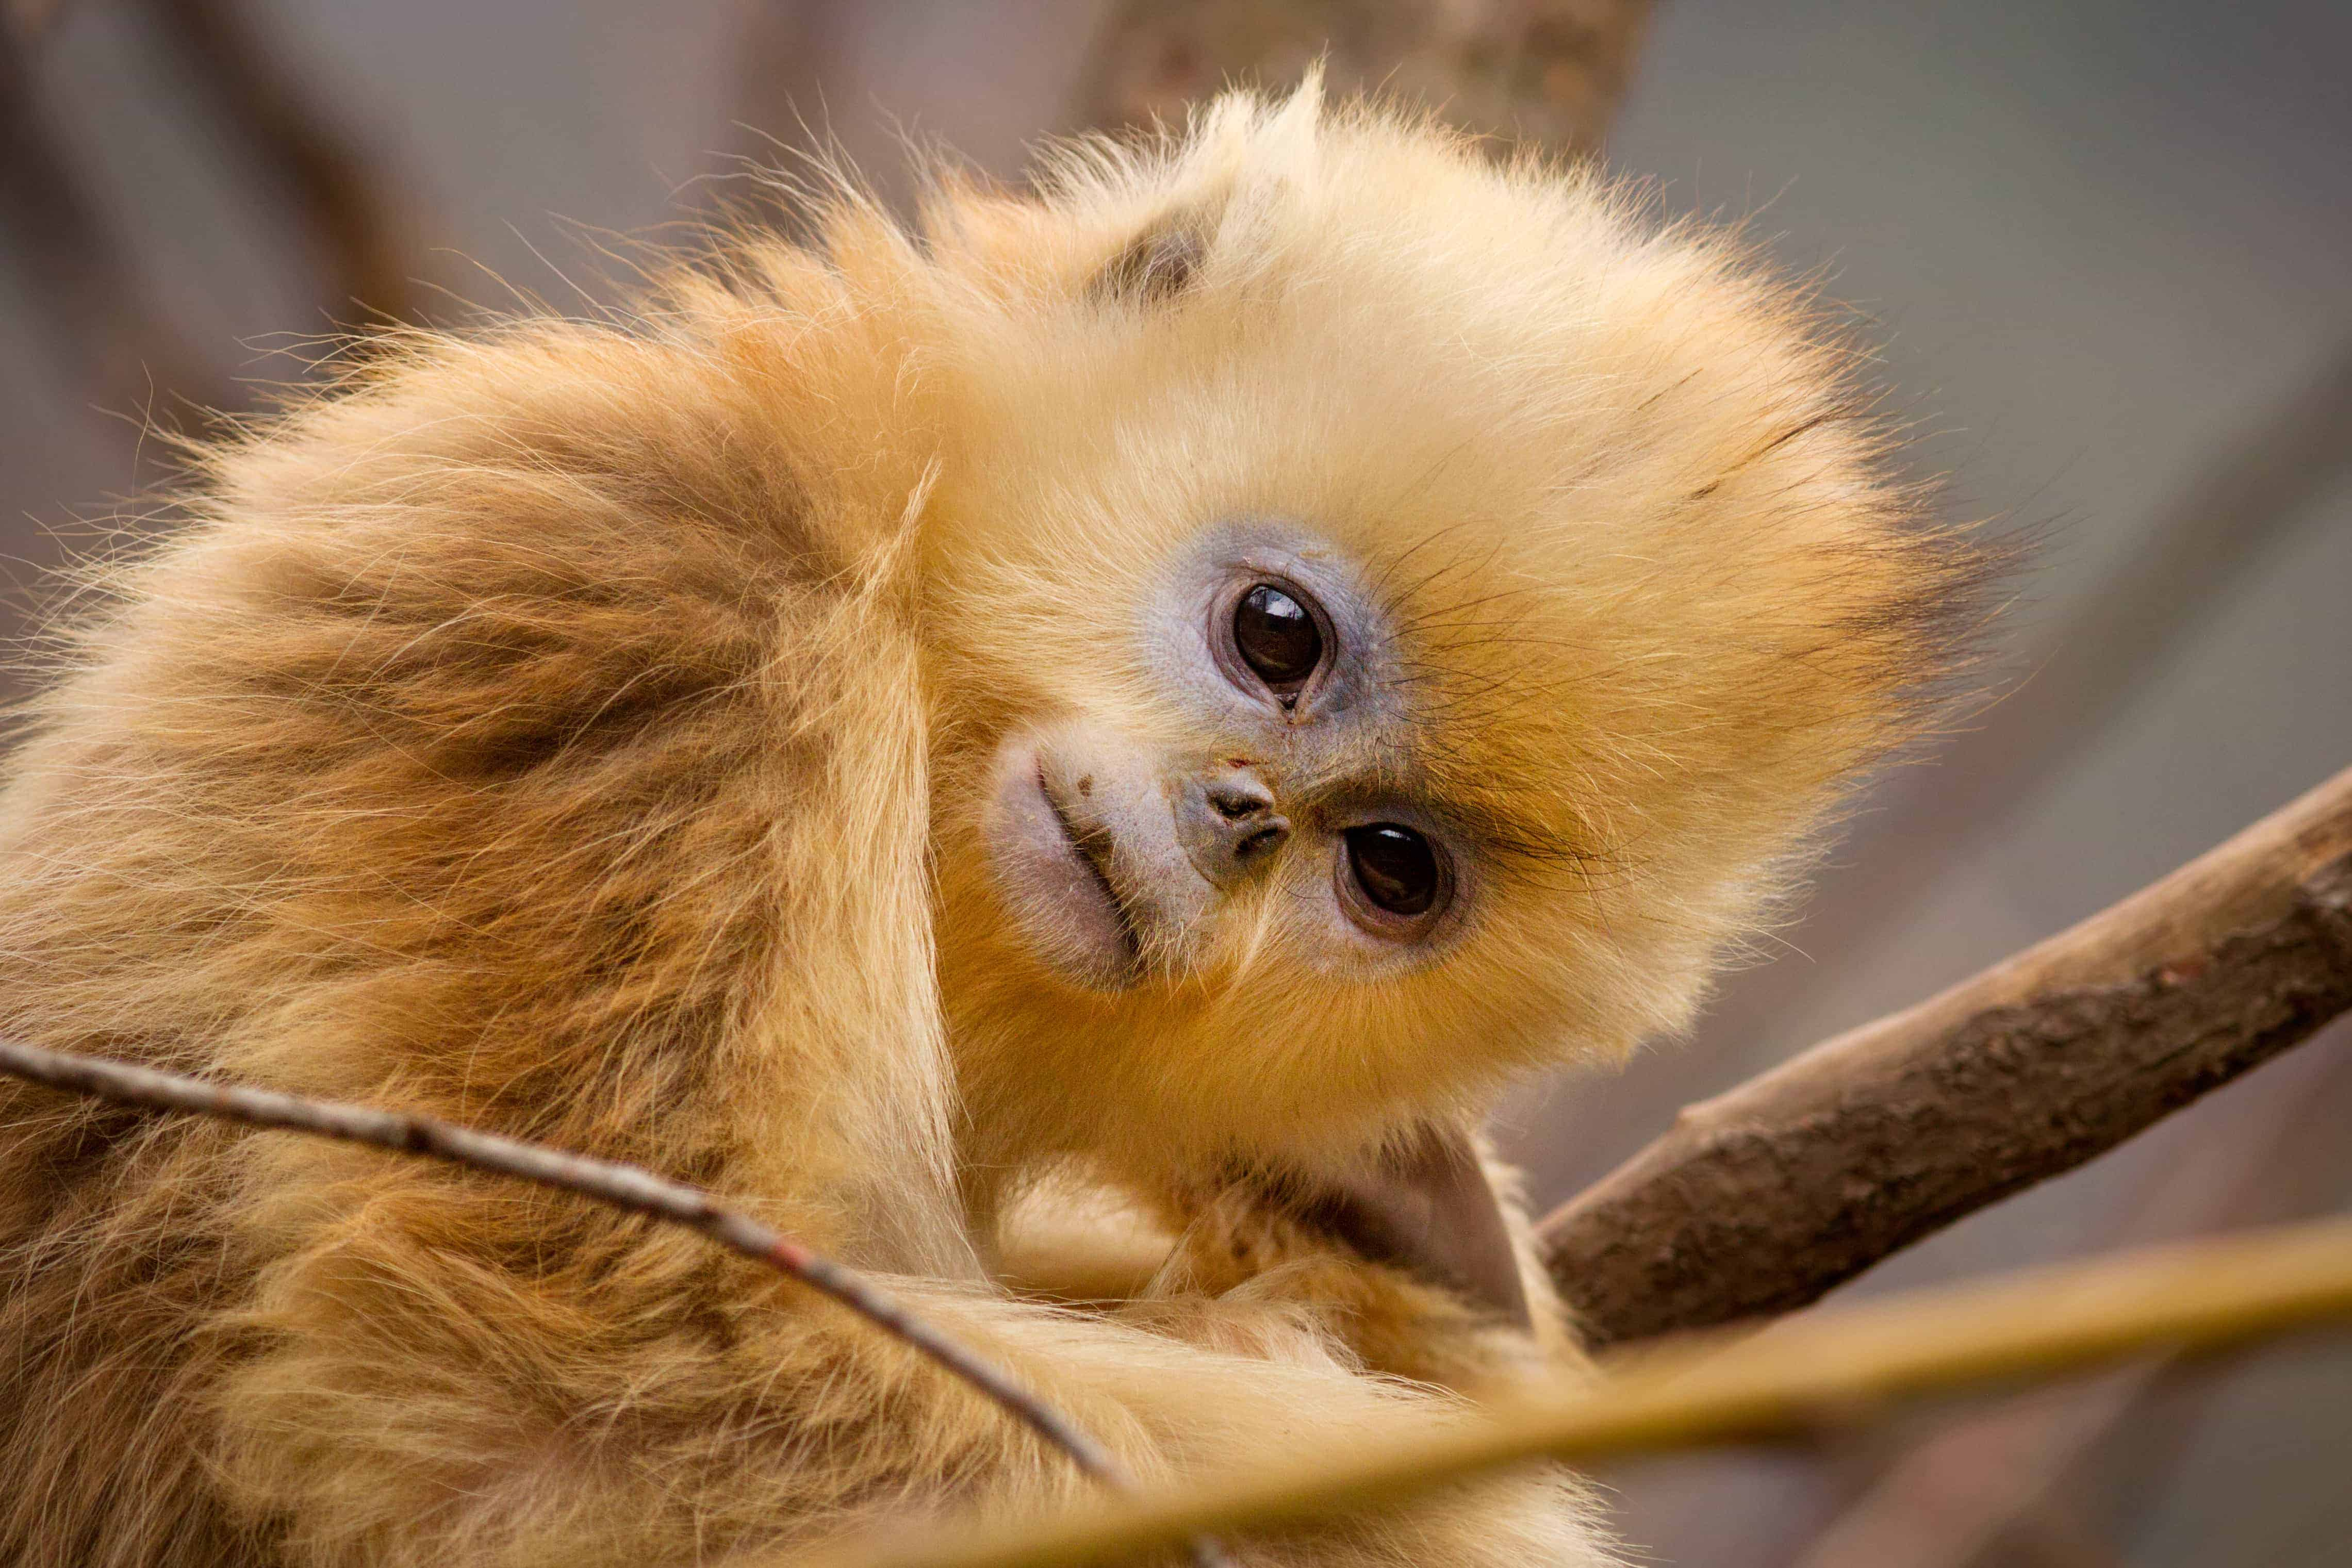 Meet Tao Tao, a golden snub-nosed monkey in Disneynature Born in China.